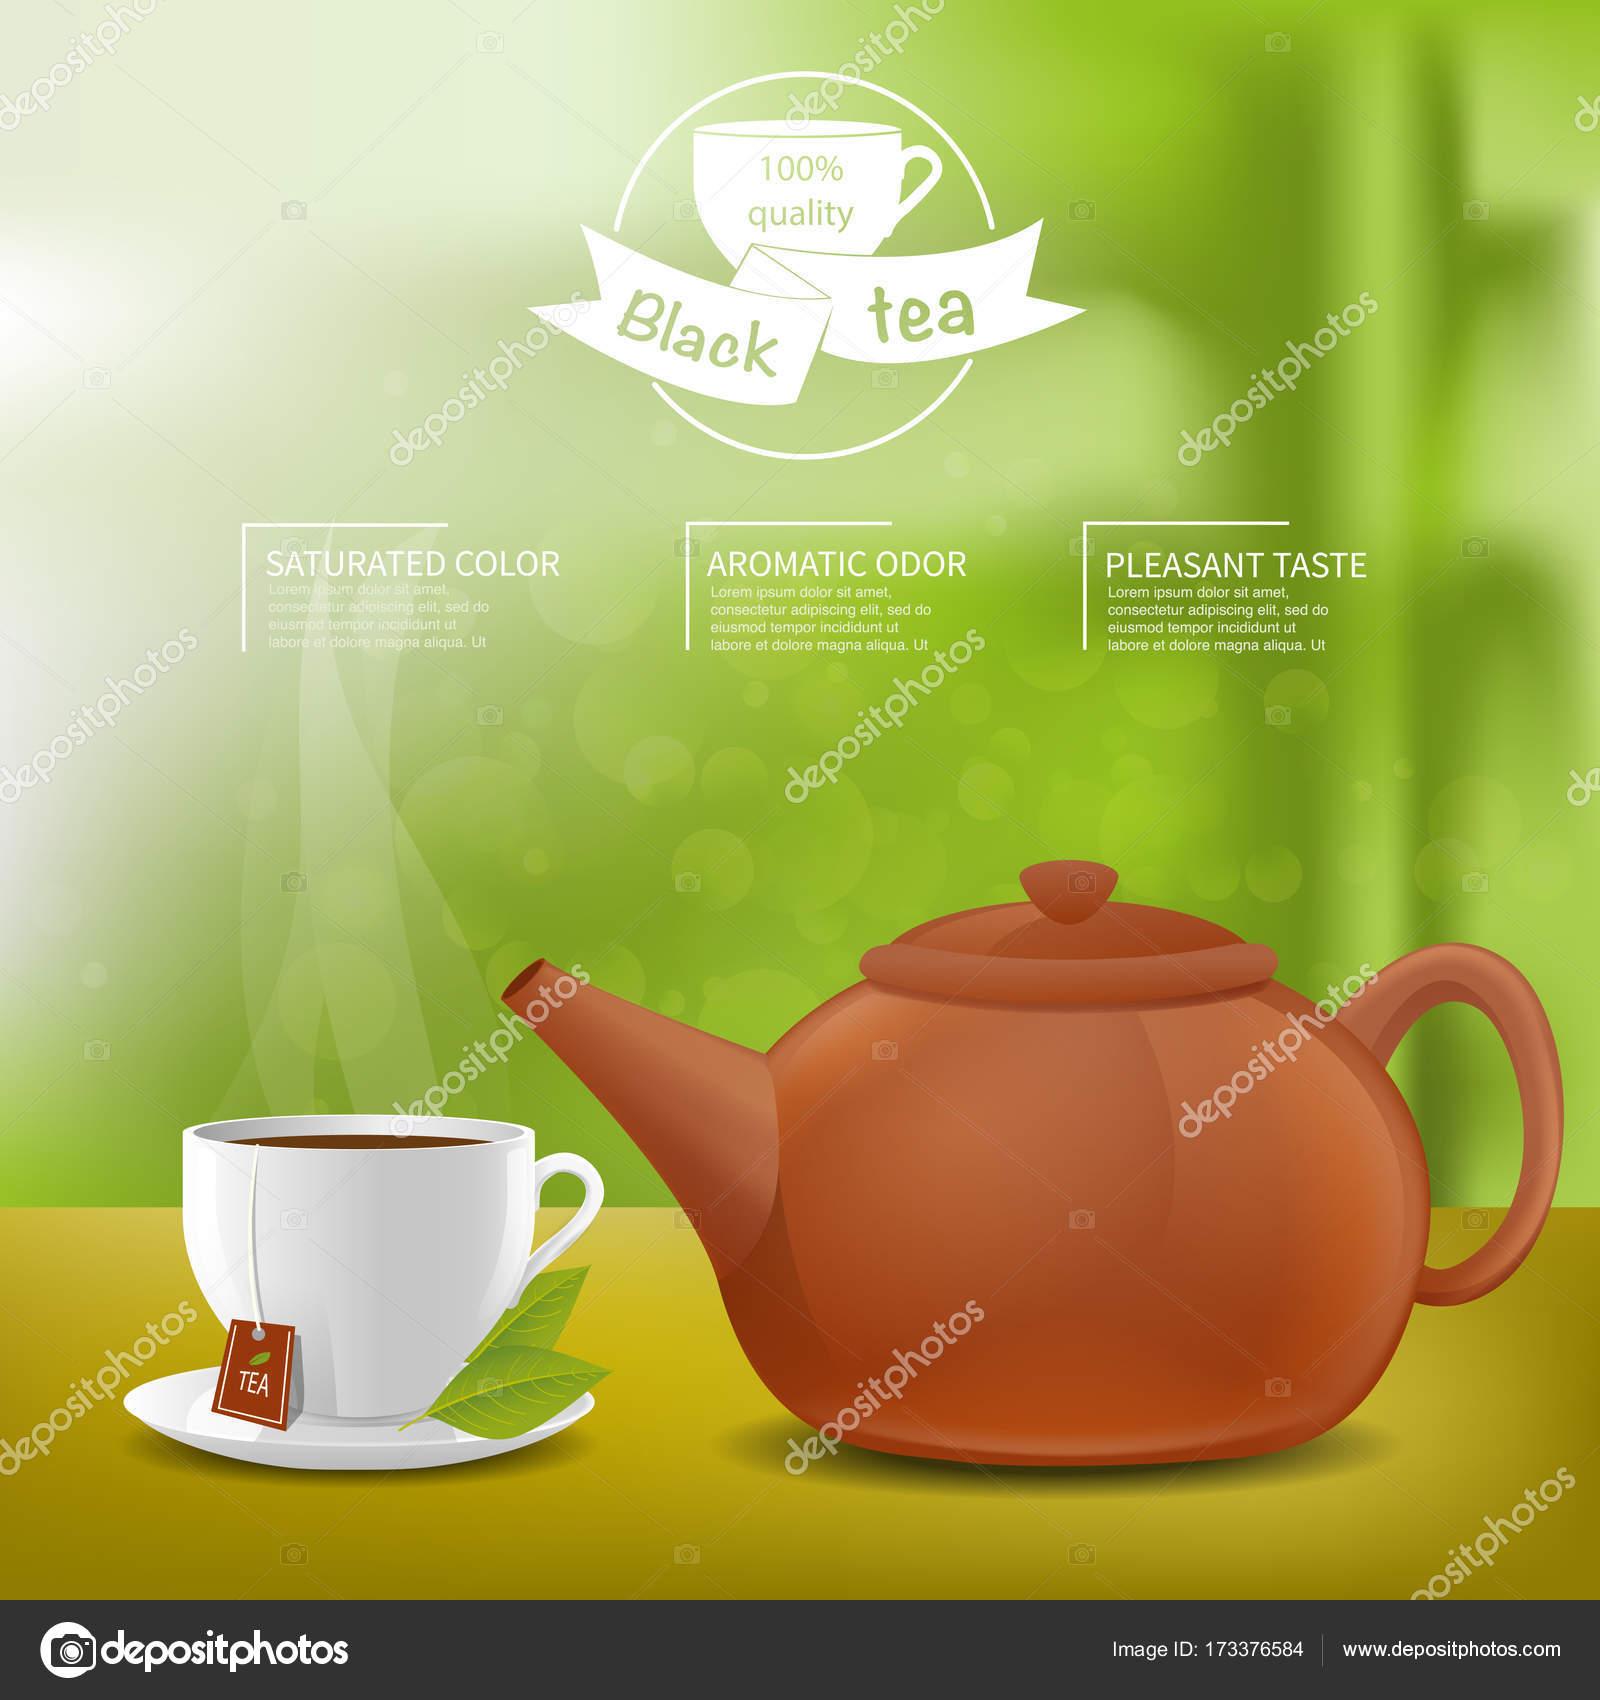 https depositphotos com 173376584 stock illustration tea advertising poster template html